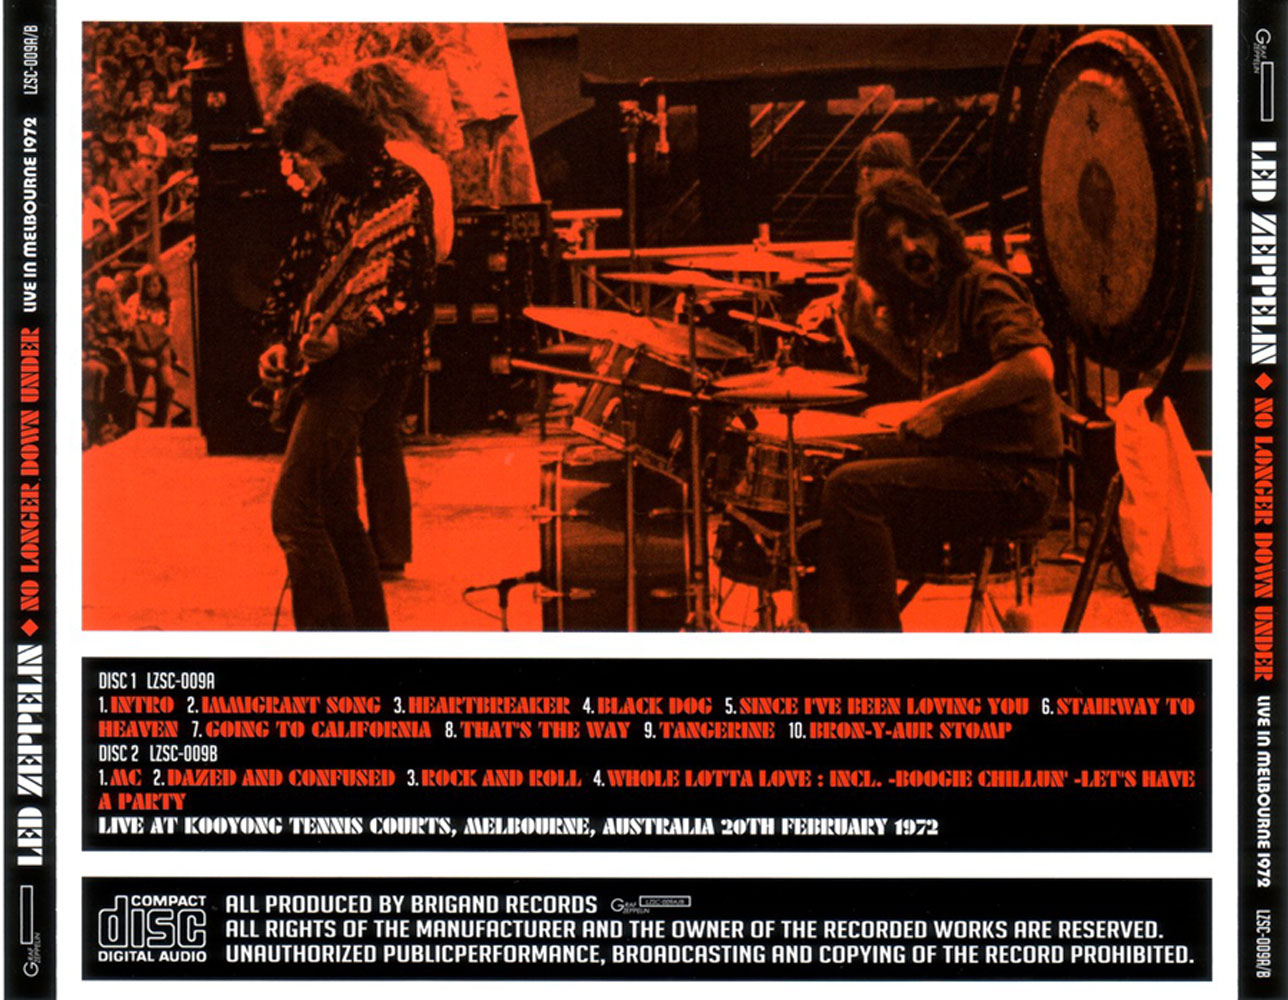 Led Zeppelin - No Longer Down Under (2CD) (2011) {Brigand} **[RE-UP]**